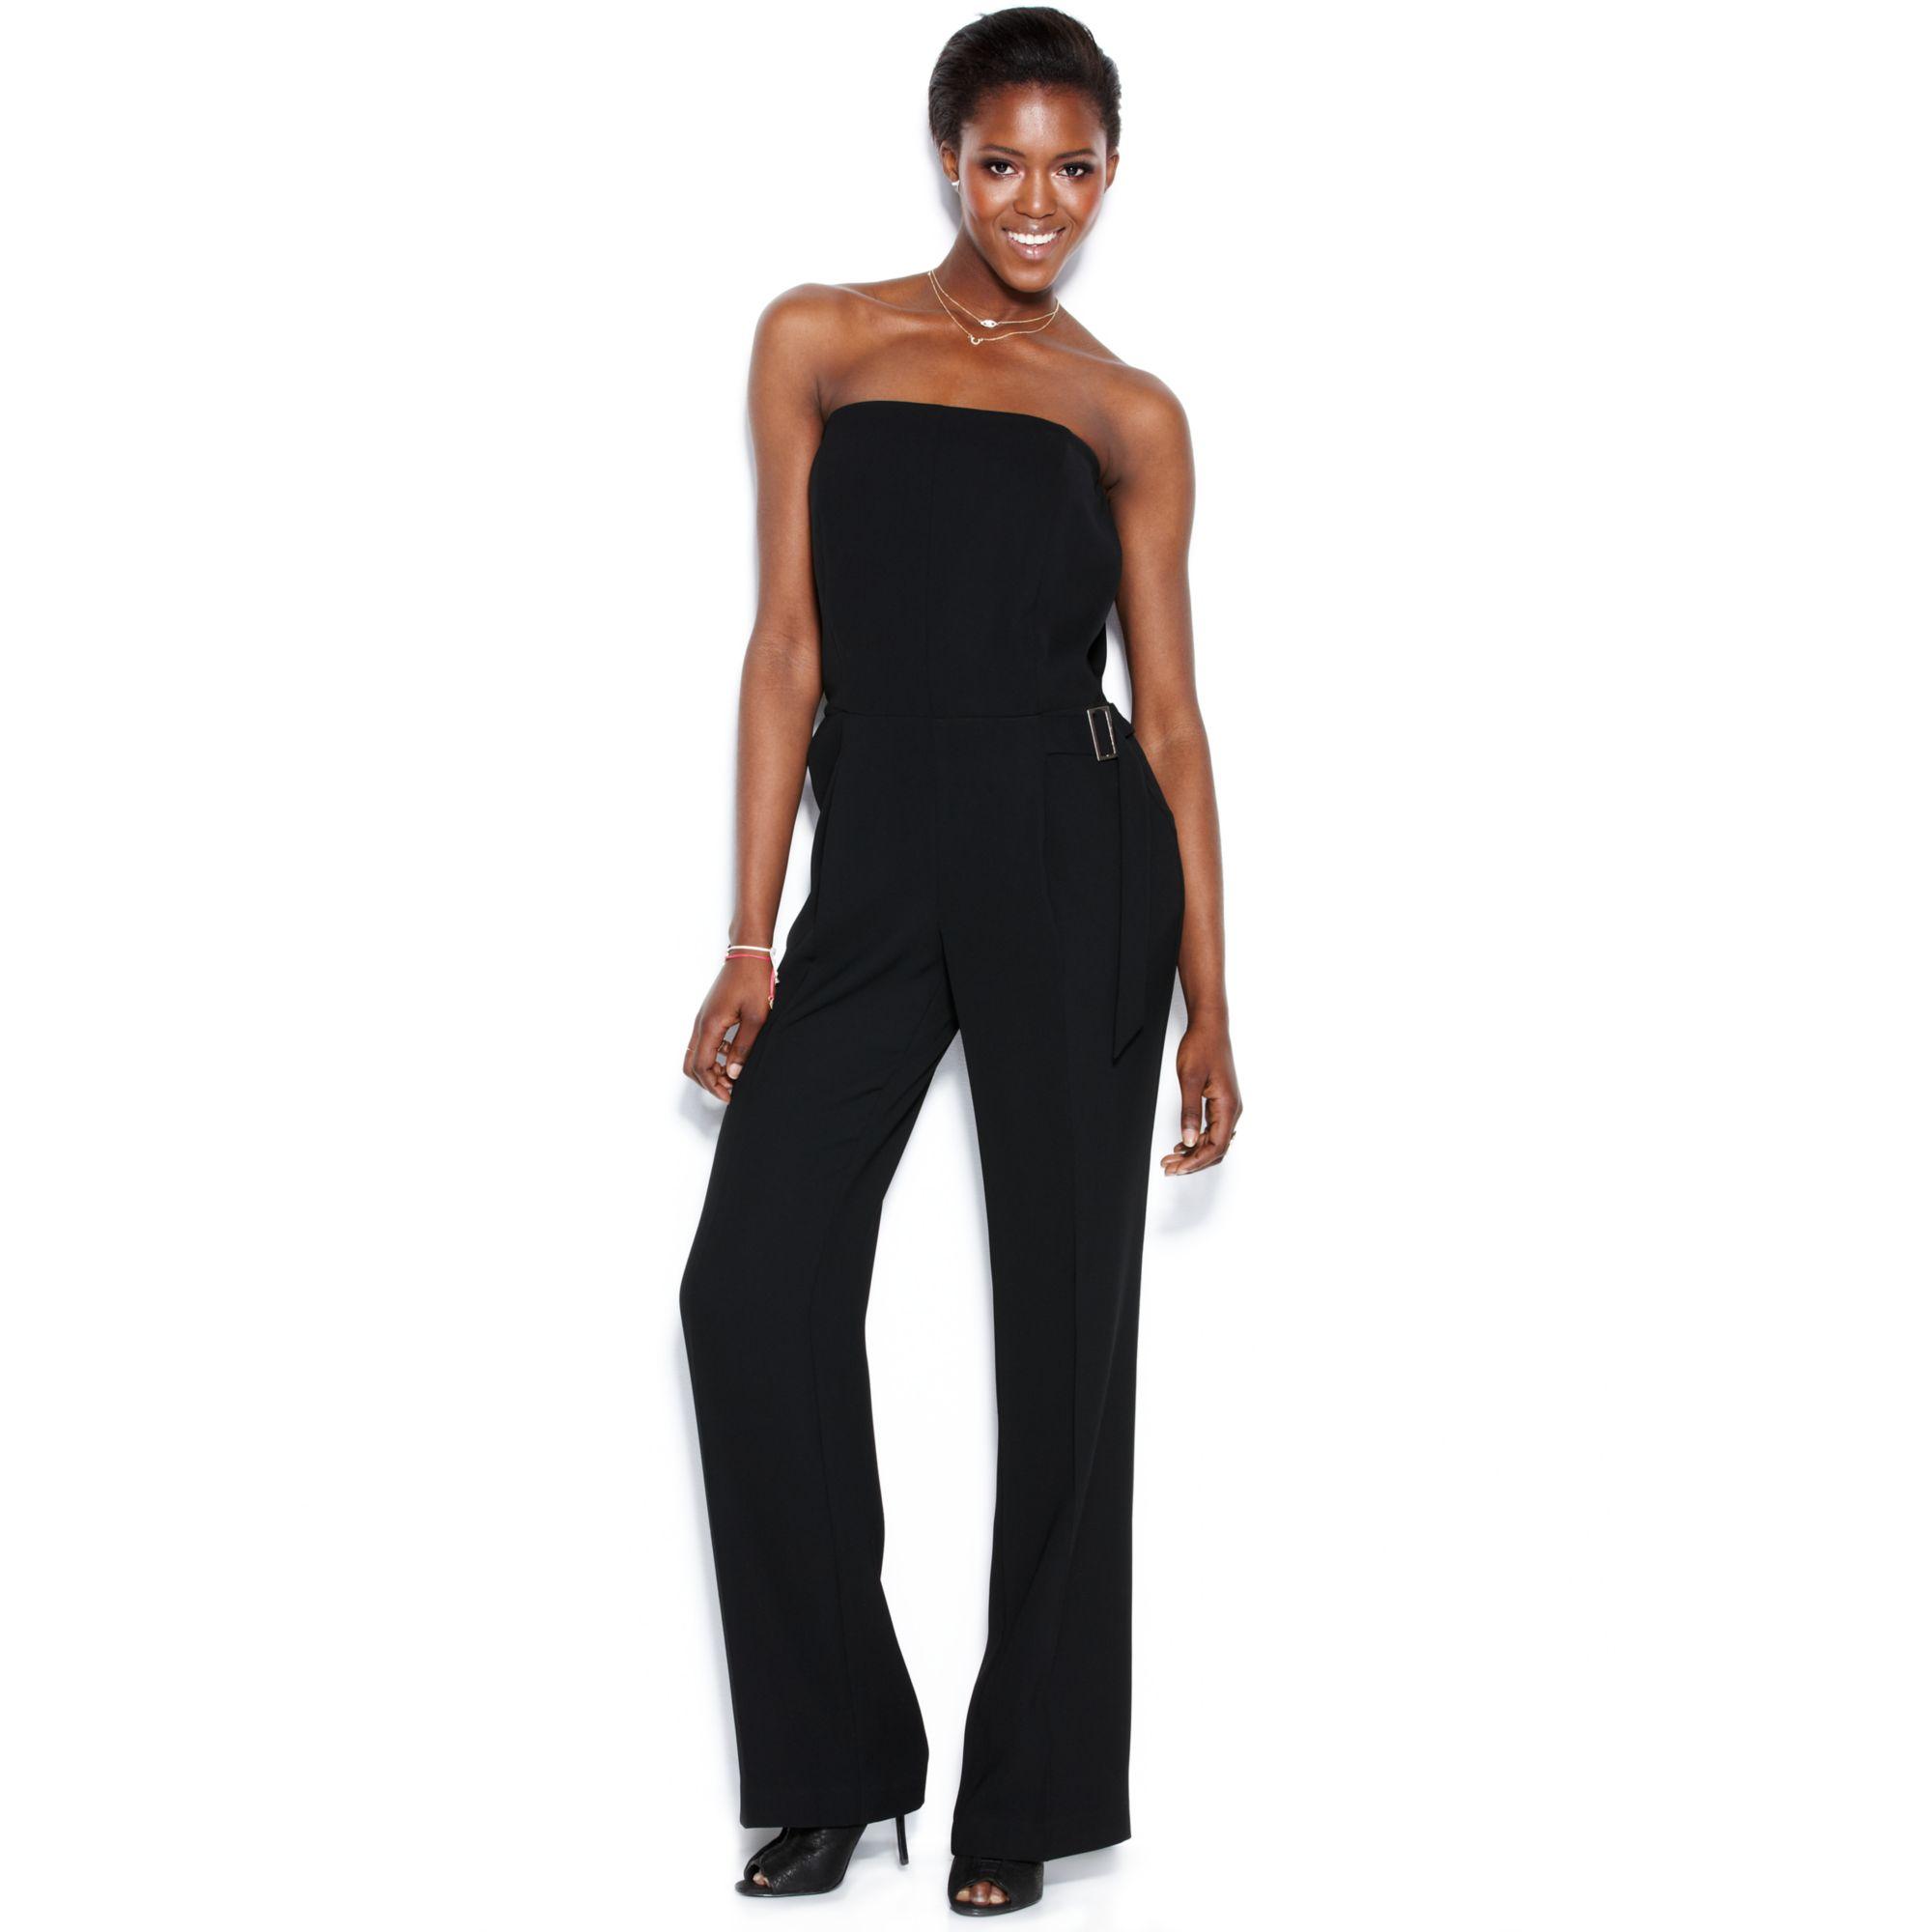 2ad0a2938d37 Lyst - RACHEL Rachel Roy Strapless Wideleg Jumpsuit in Black